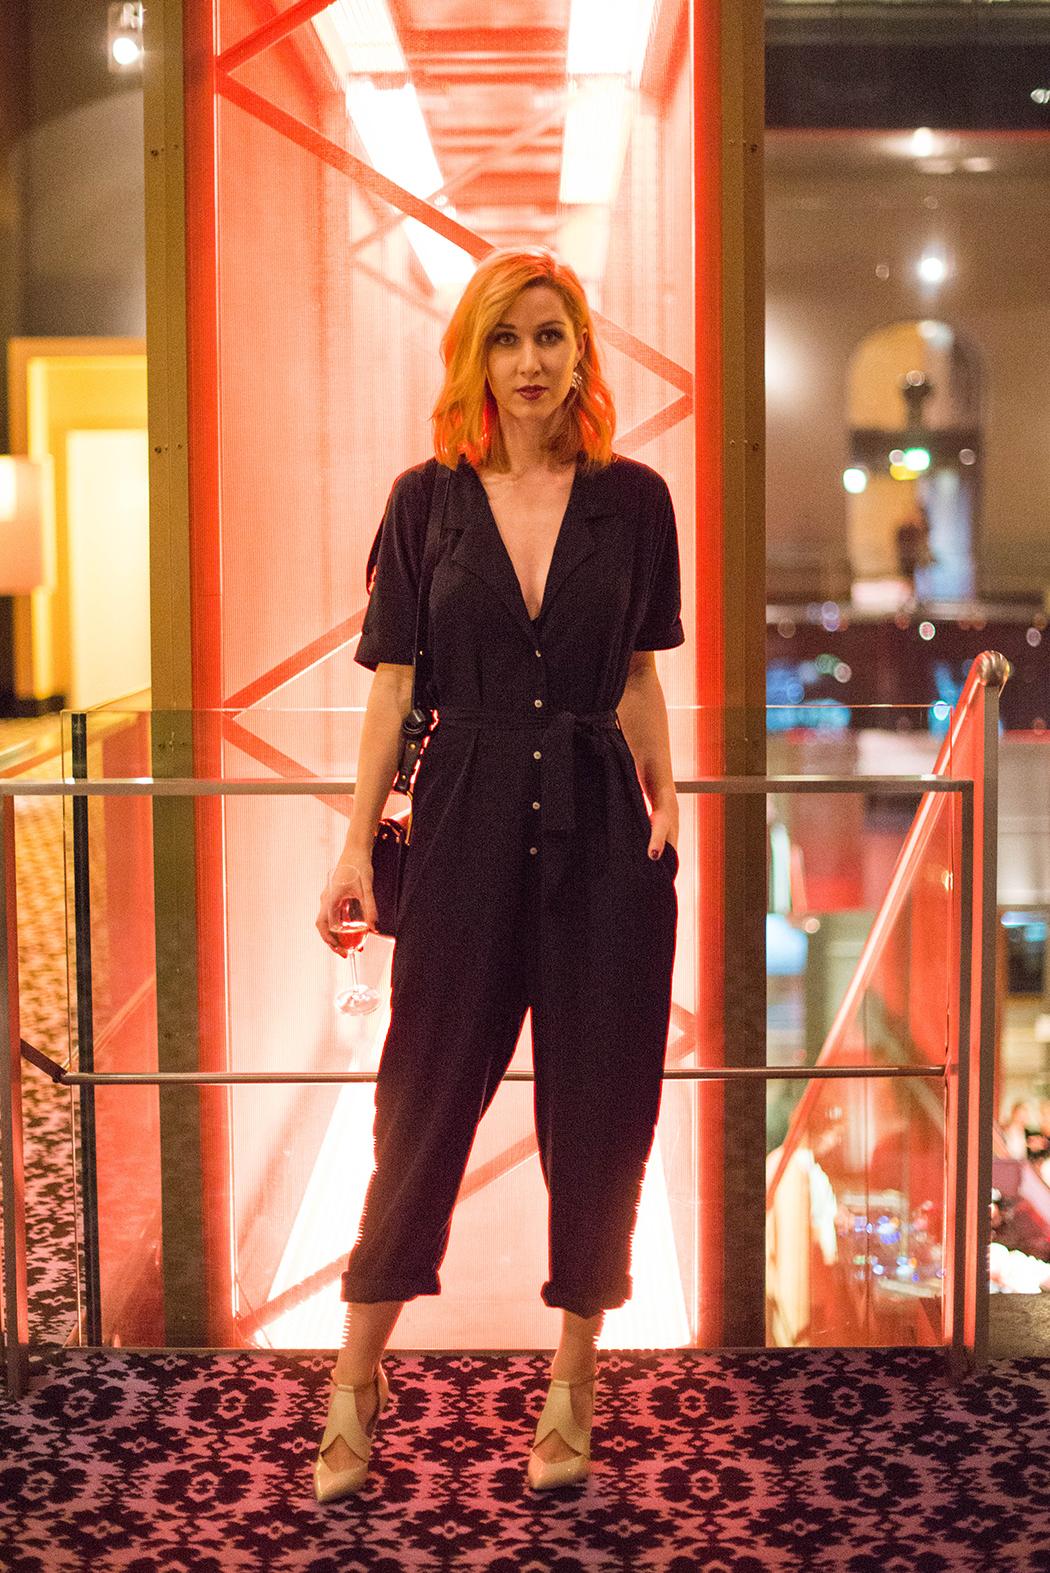 Fashionblog-Fashionblogger-Fashion-Blog-Blogger-Lifestyle-Lindarella-Marcel-Ostertag-Fashionshow-3-web